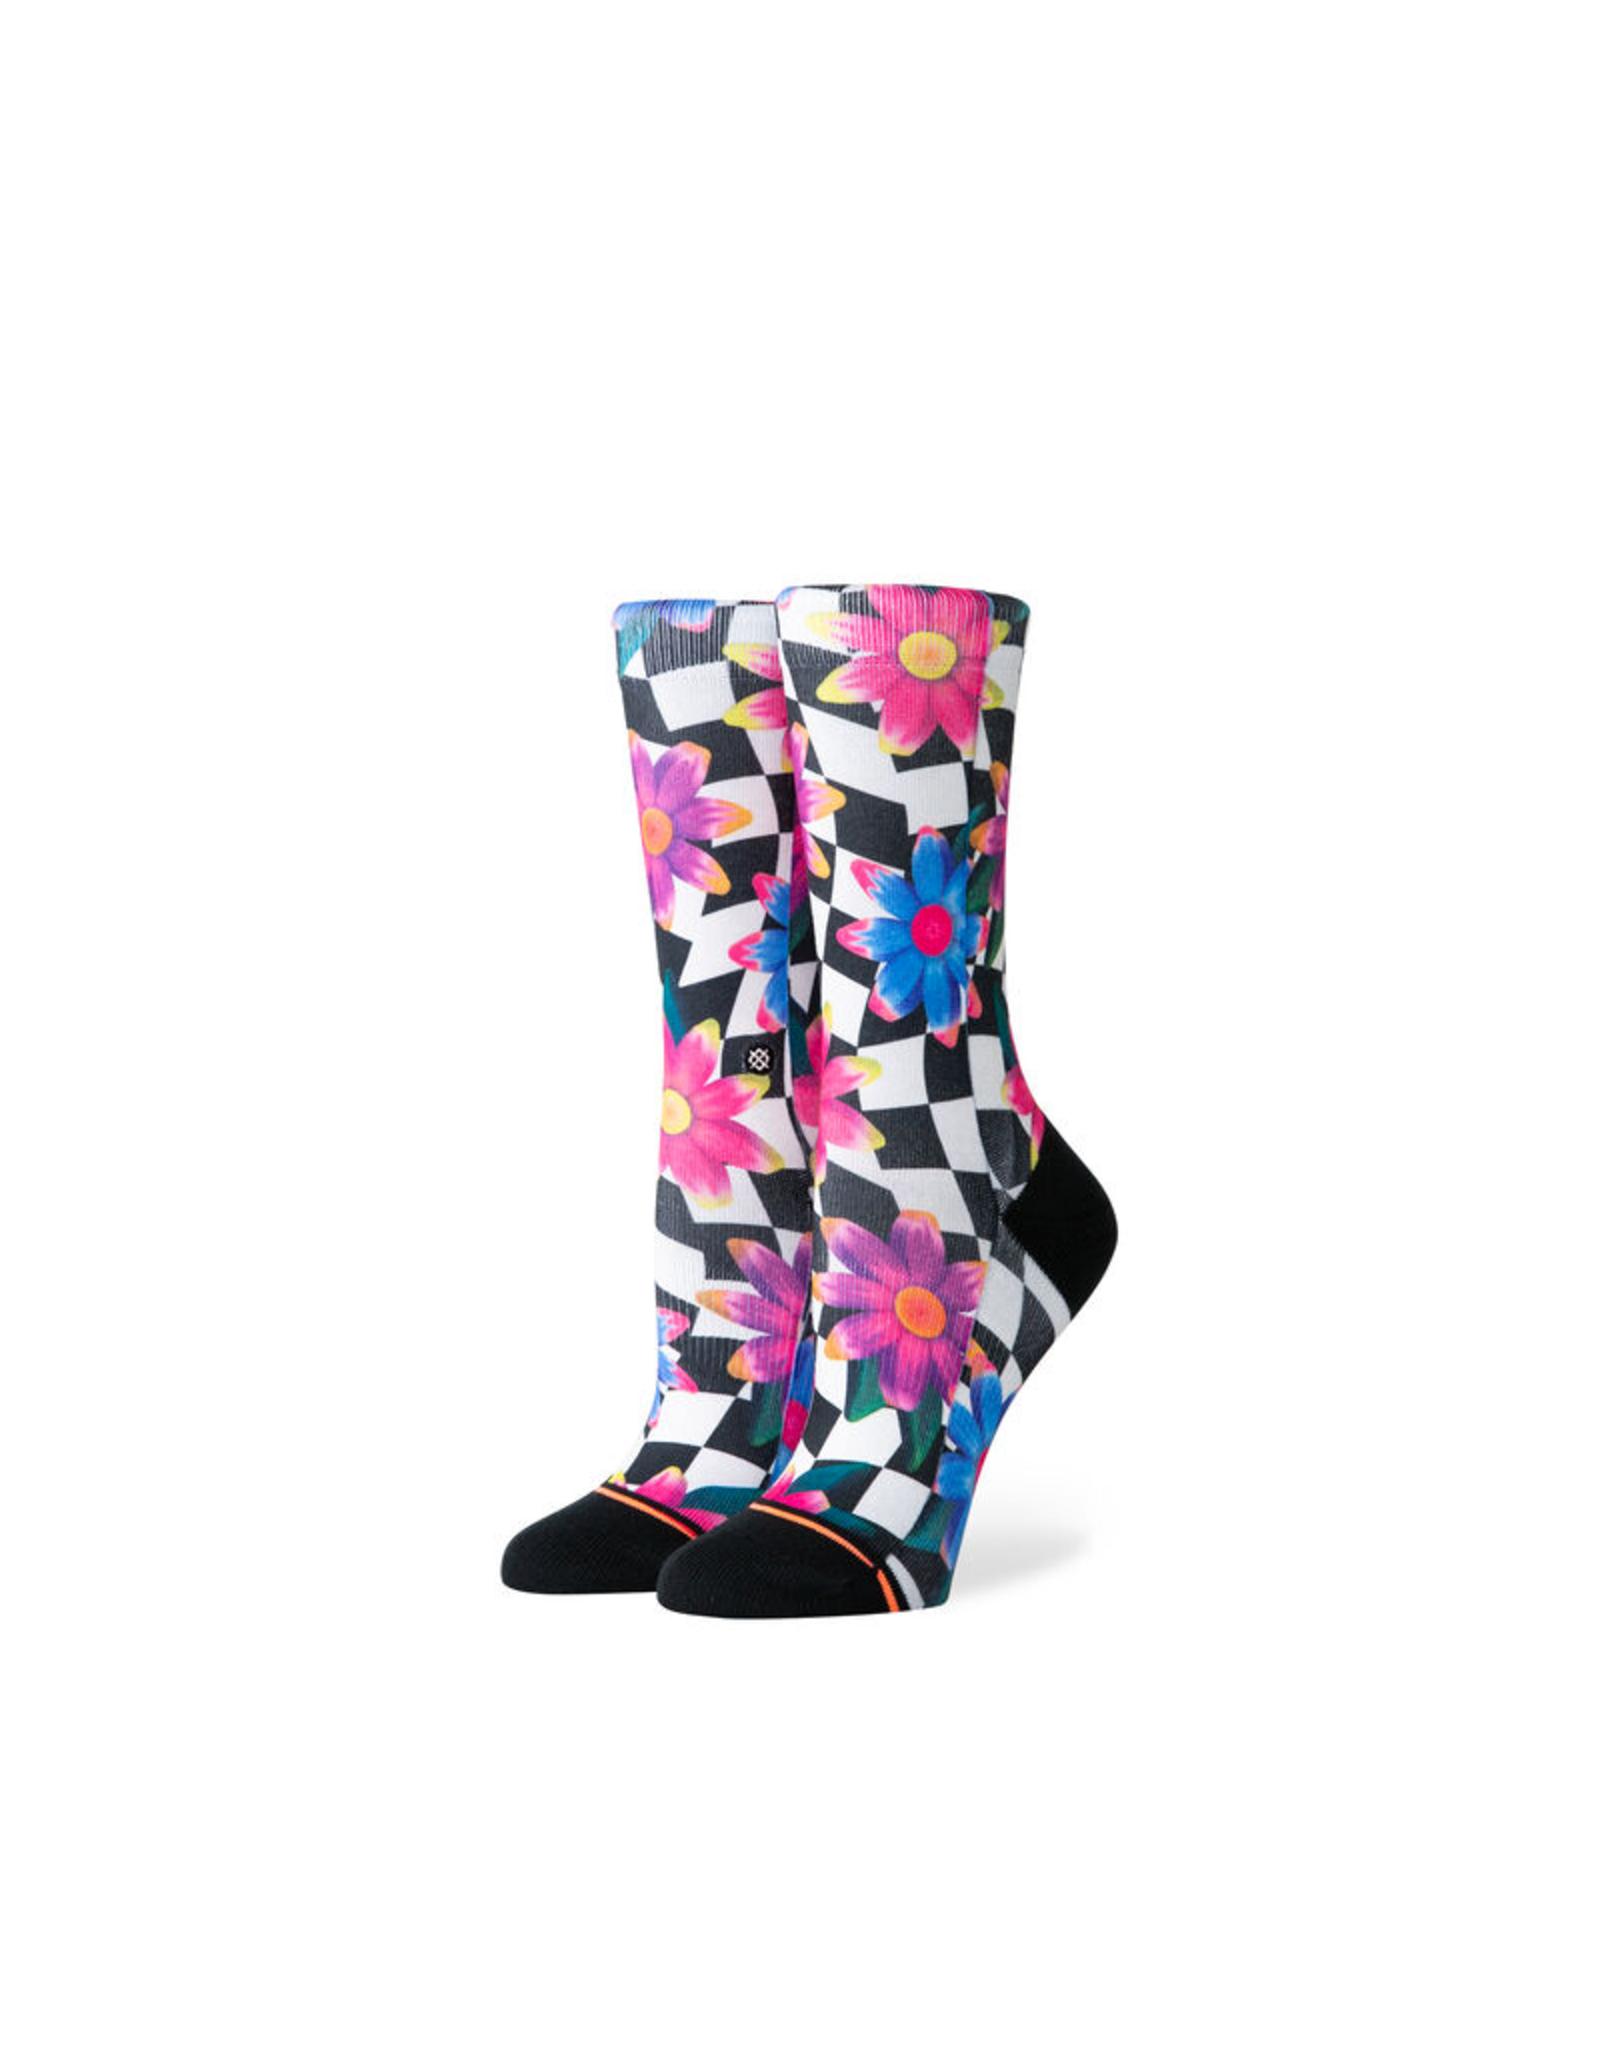 Crazy Daisy Crew Socks